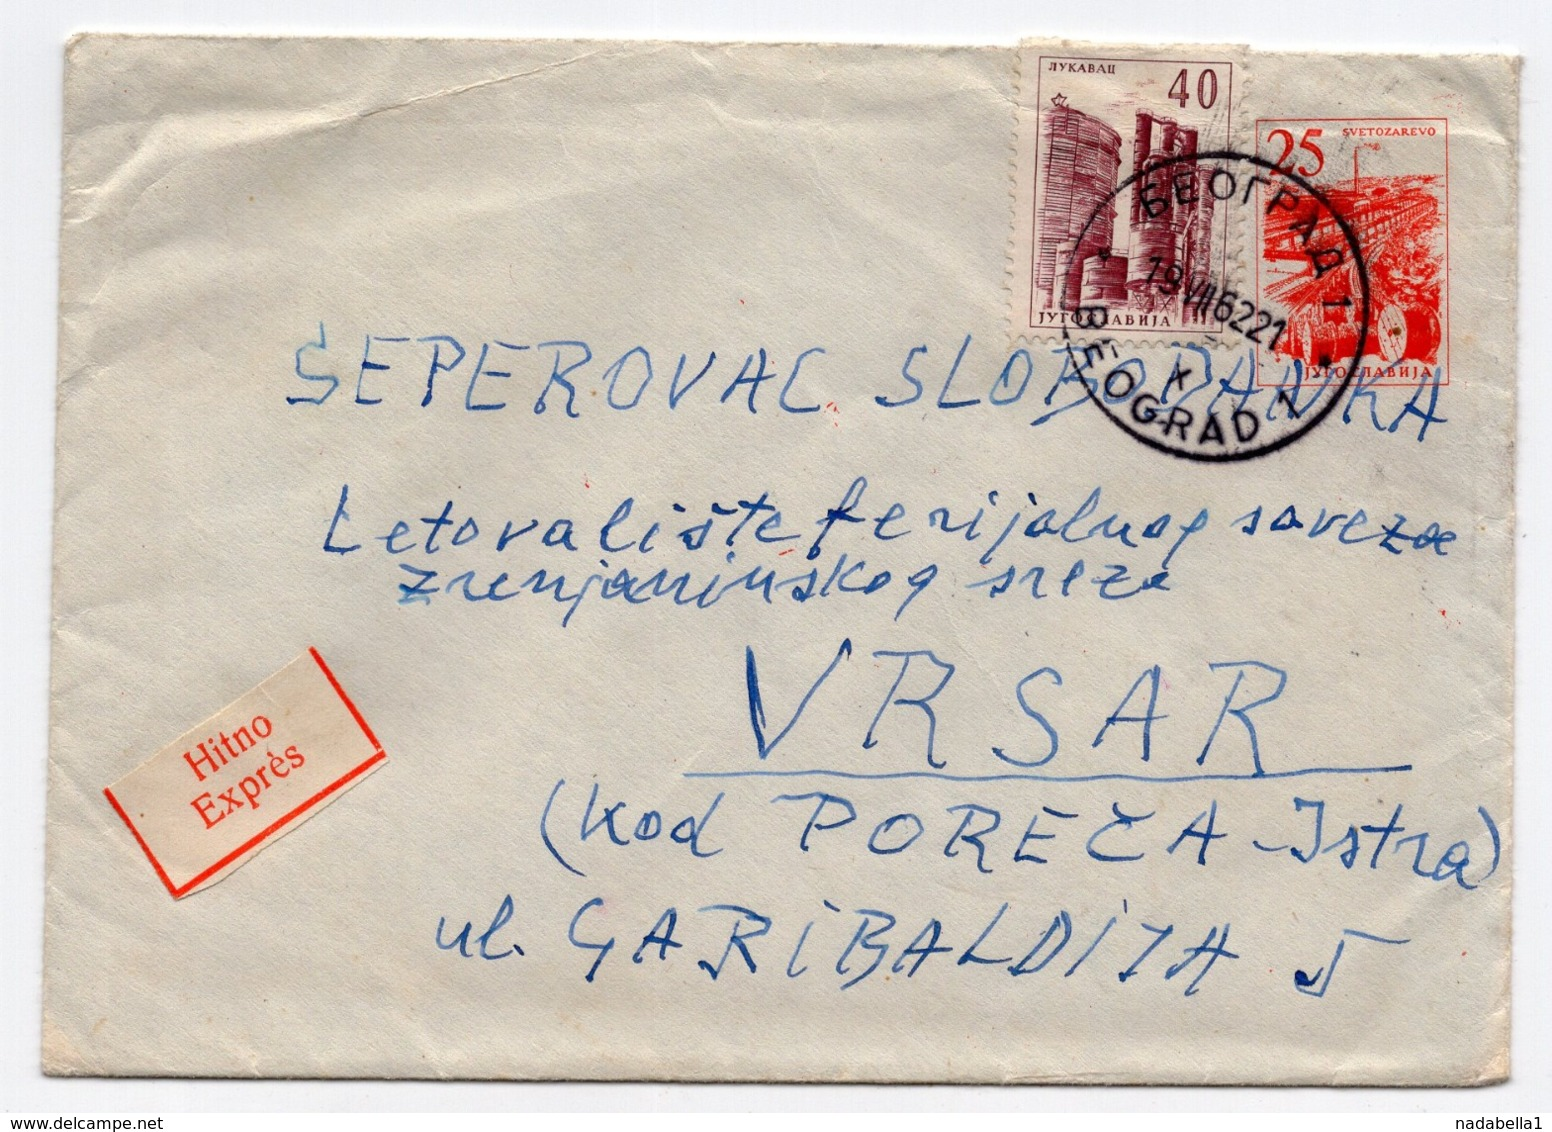 1962 YUGOSLAVIA, SERBIA, BELGRADE TO VRSAR, TPO BELGRADE-LJUBLJANA NO. 12 AND TPO PULA - DIVACA NO.25 - 1945-1992 Socialist Federal Republic Of Yugoslavia